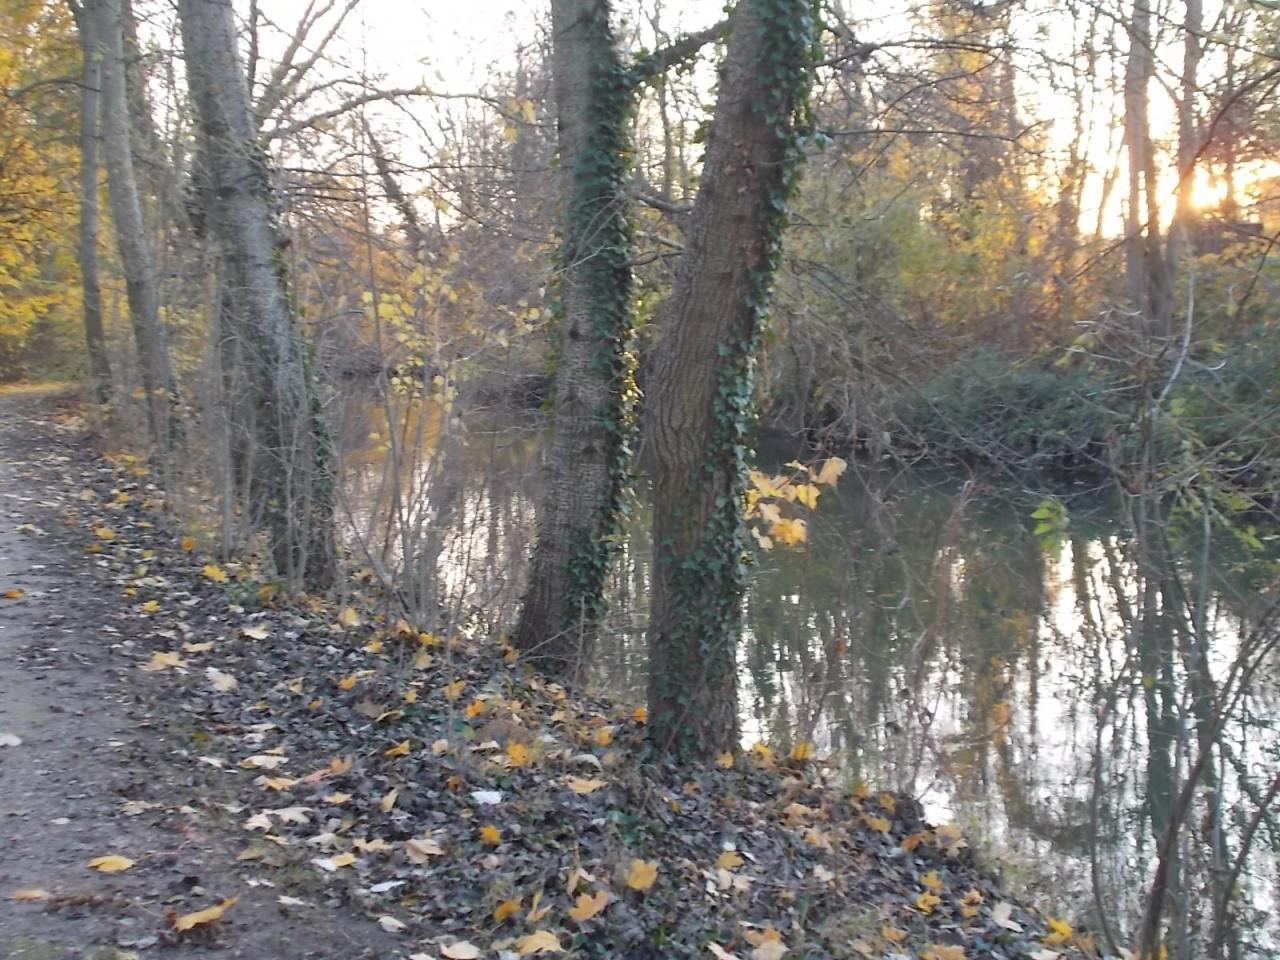 Les bords de l'Orge à Savigny